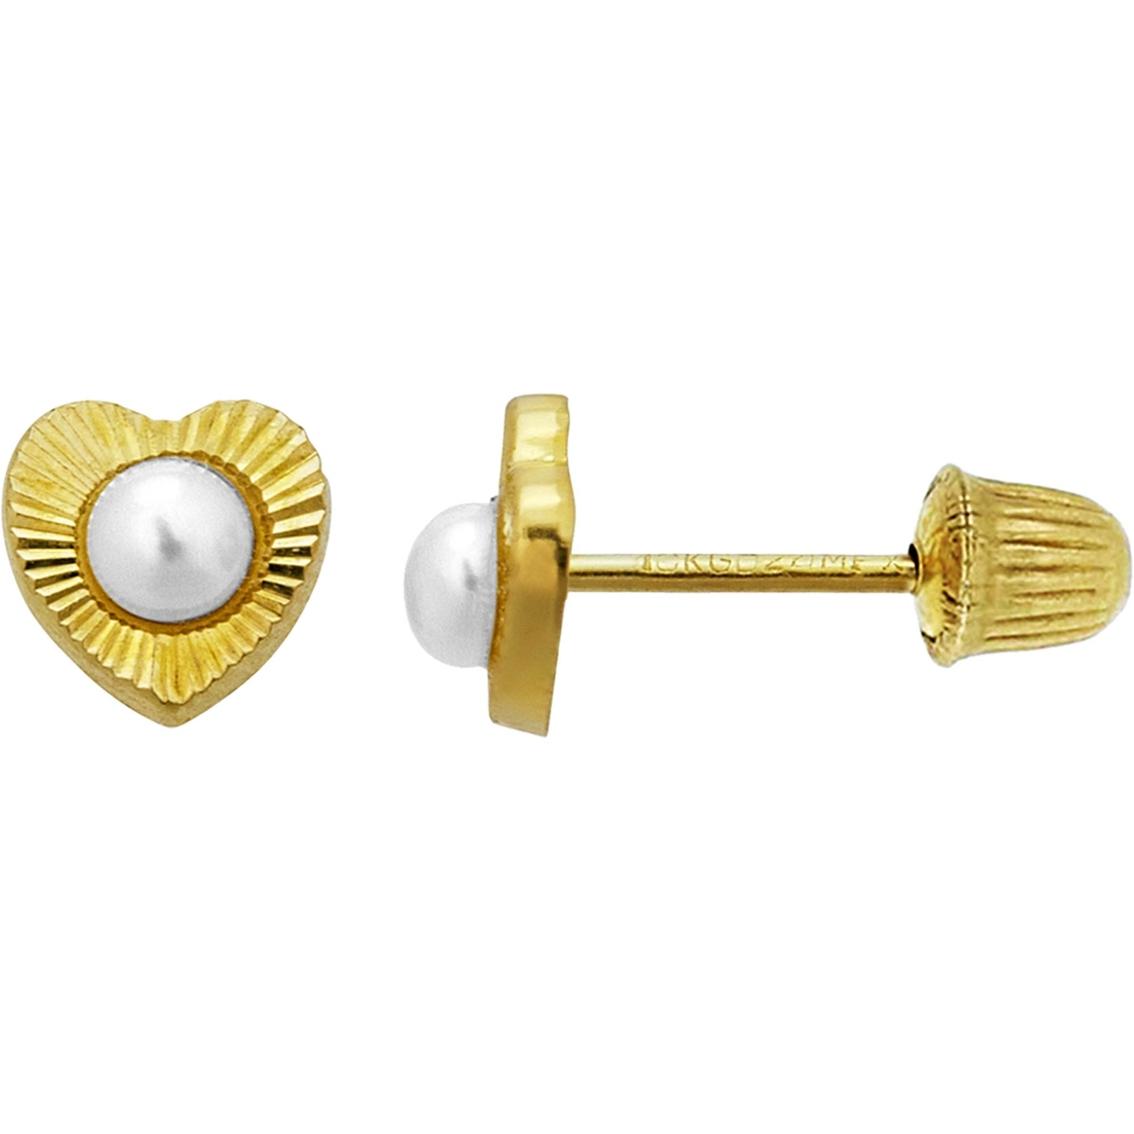 dc2531548 14k Gold Girls Freshwater Pearl Heart Screwback Stud Earrings ...